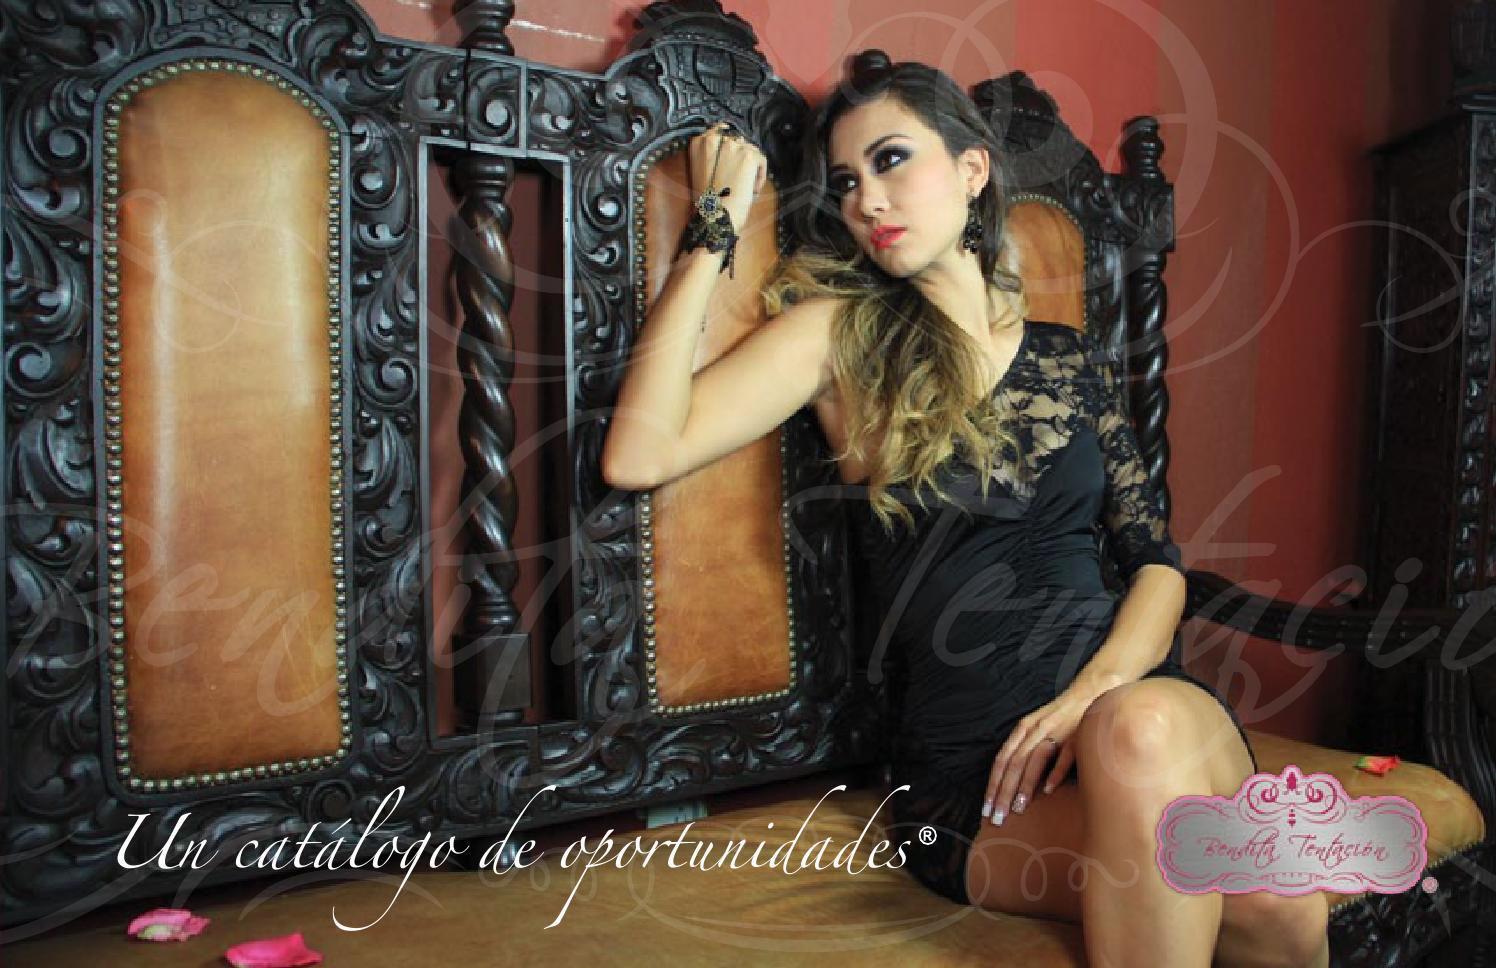 Catalogo 2014 completo by Bendita Tentacion Lenceria Fina - issuu 20c479cc062b